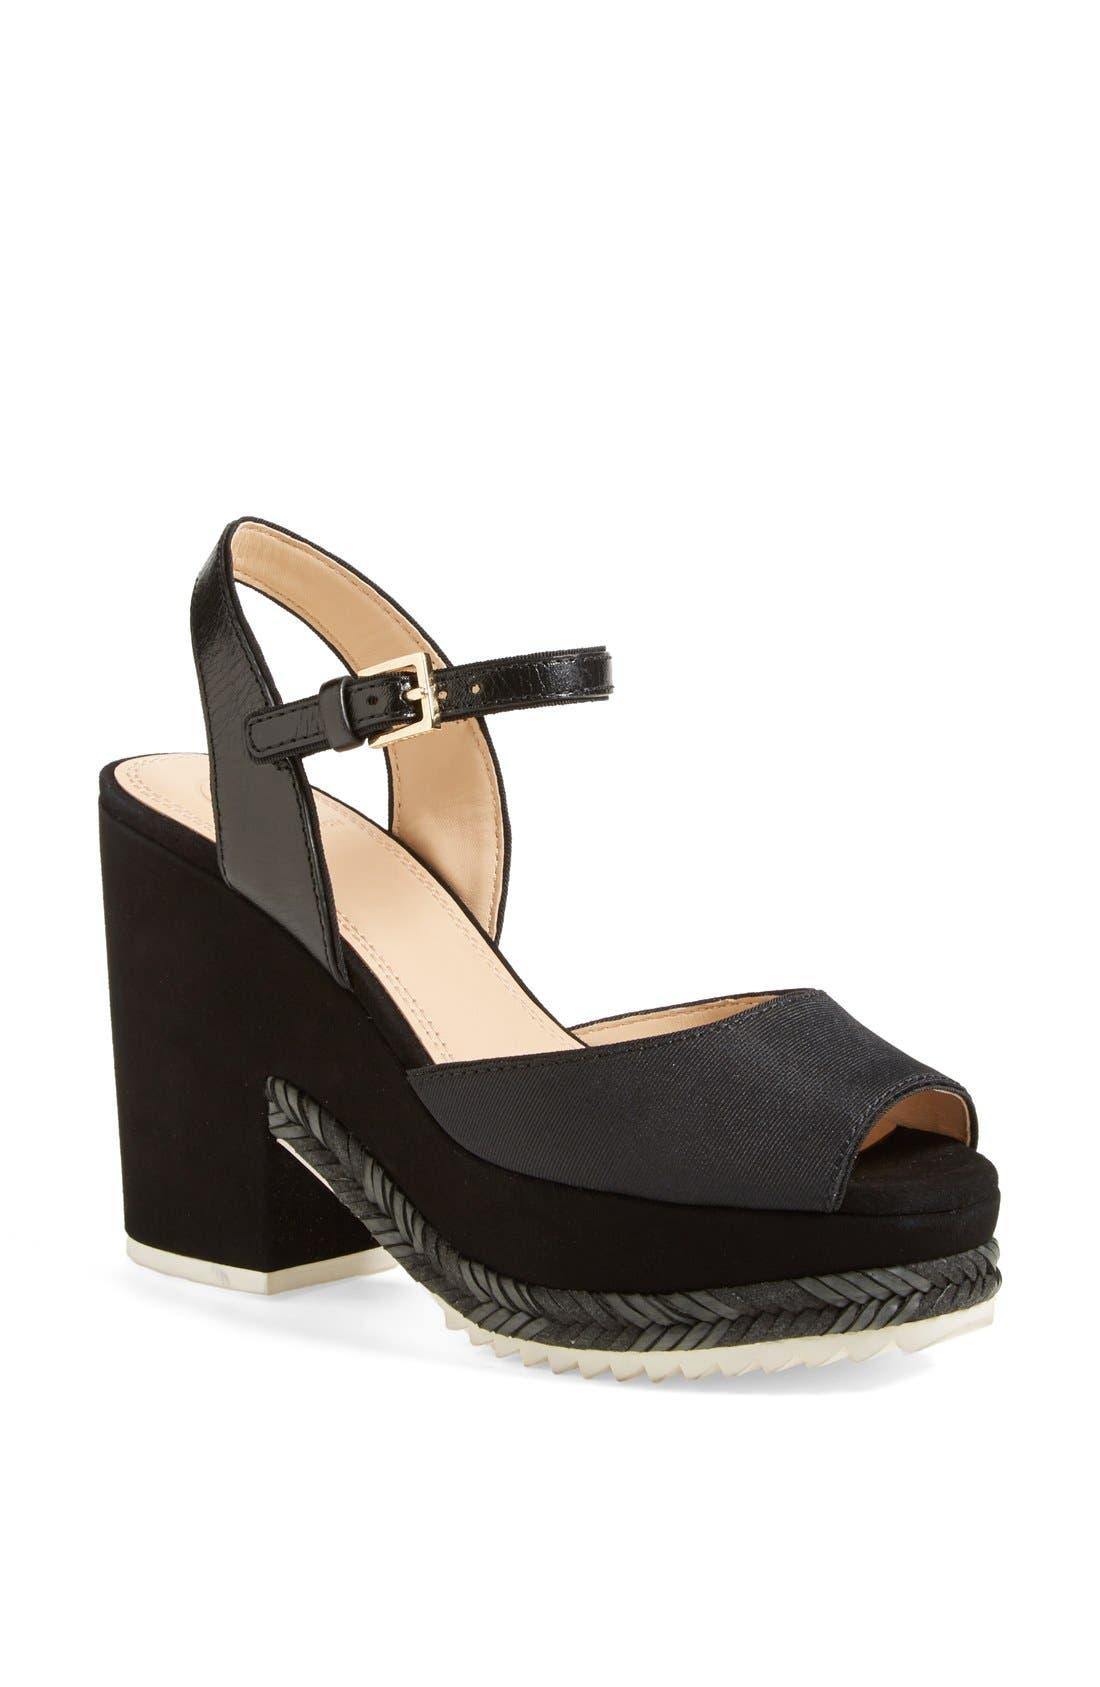 Alternate Image 1 Selected - Tory Burch 'Brie' Platform Sandal